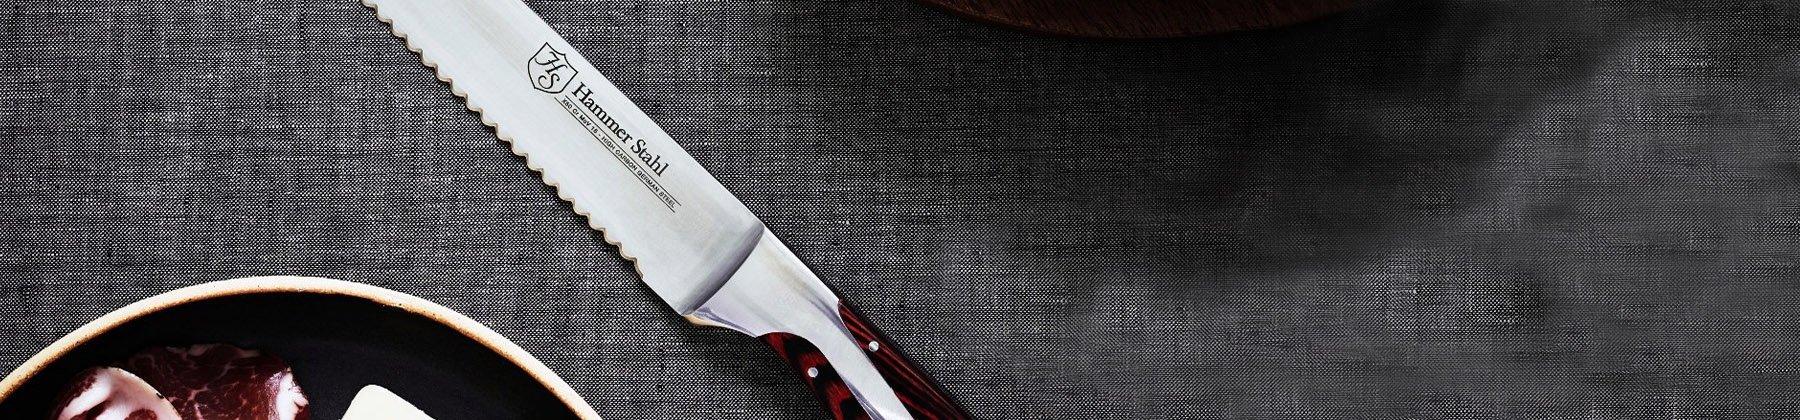 Photo of bread knives.